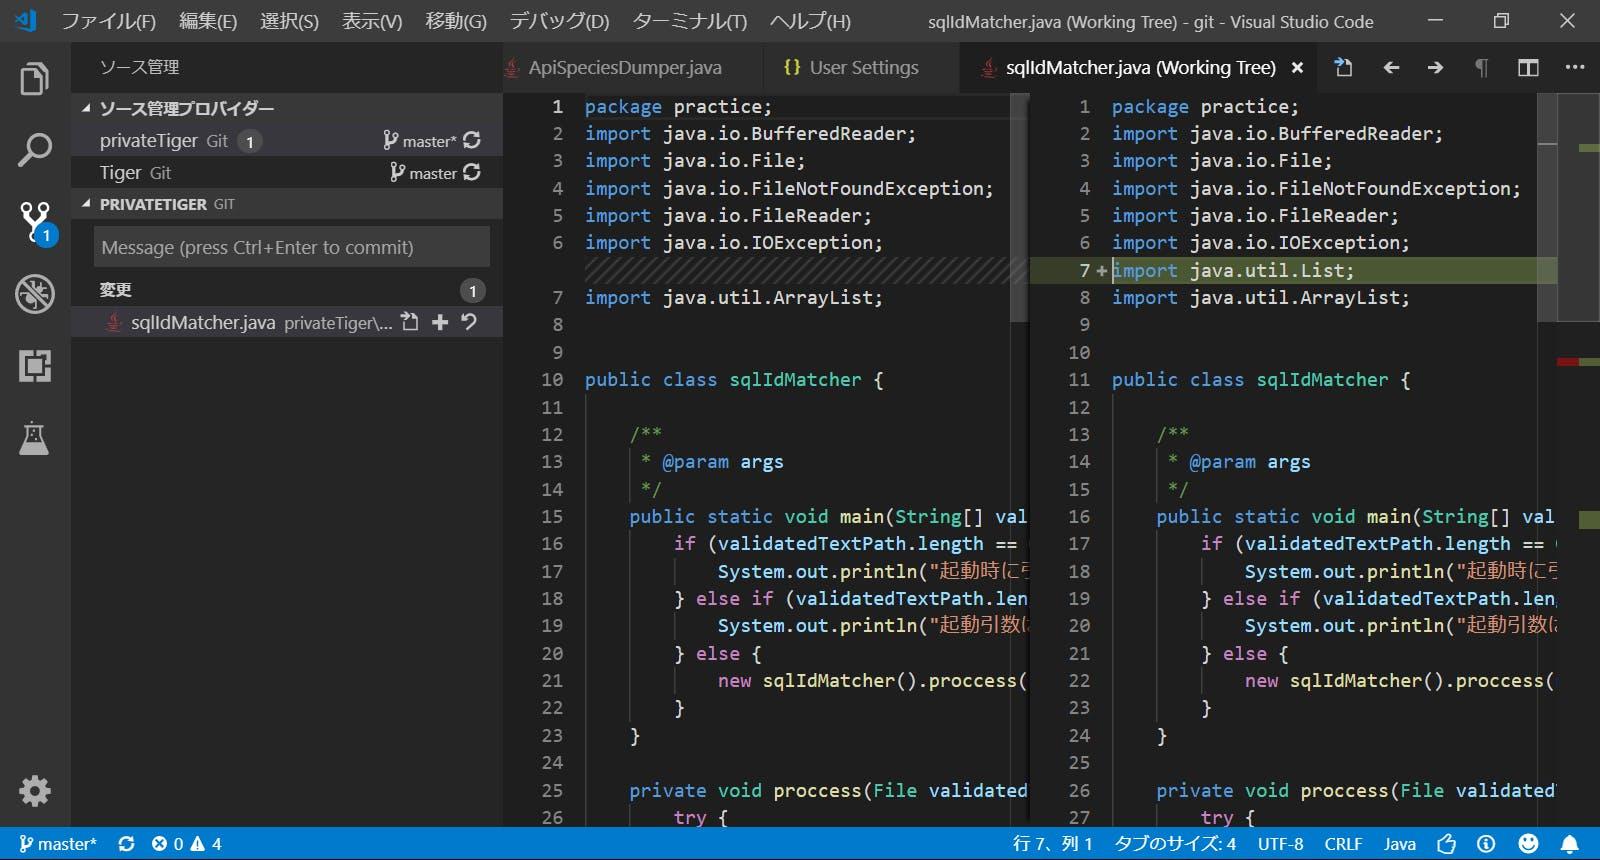 SnapCrab_sqlIdMatcherjava (Working Tree) - git - Visual Studio Code_2019-1-19_23-50-12_No-00.png